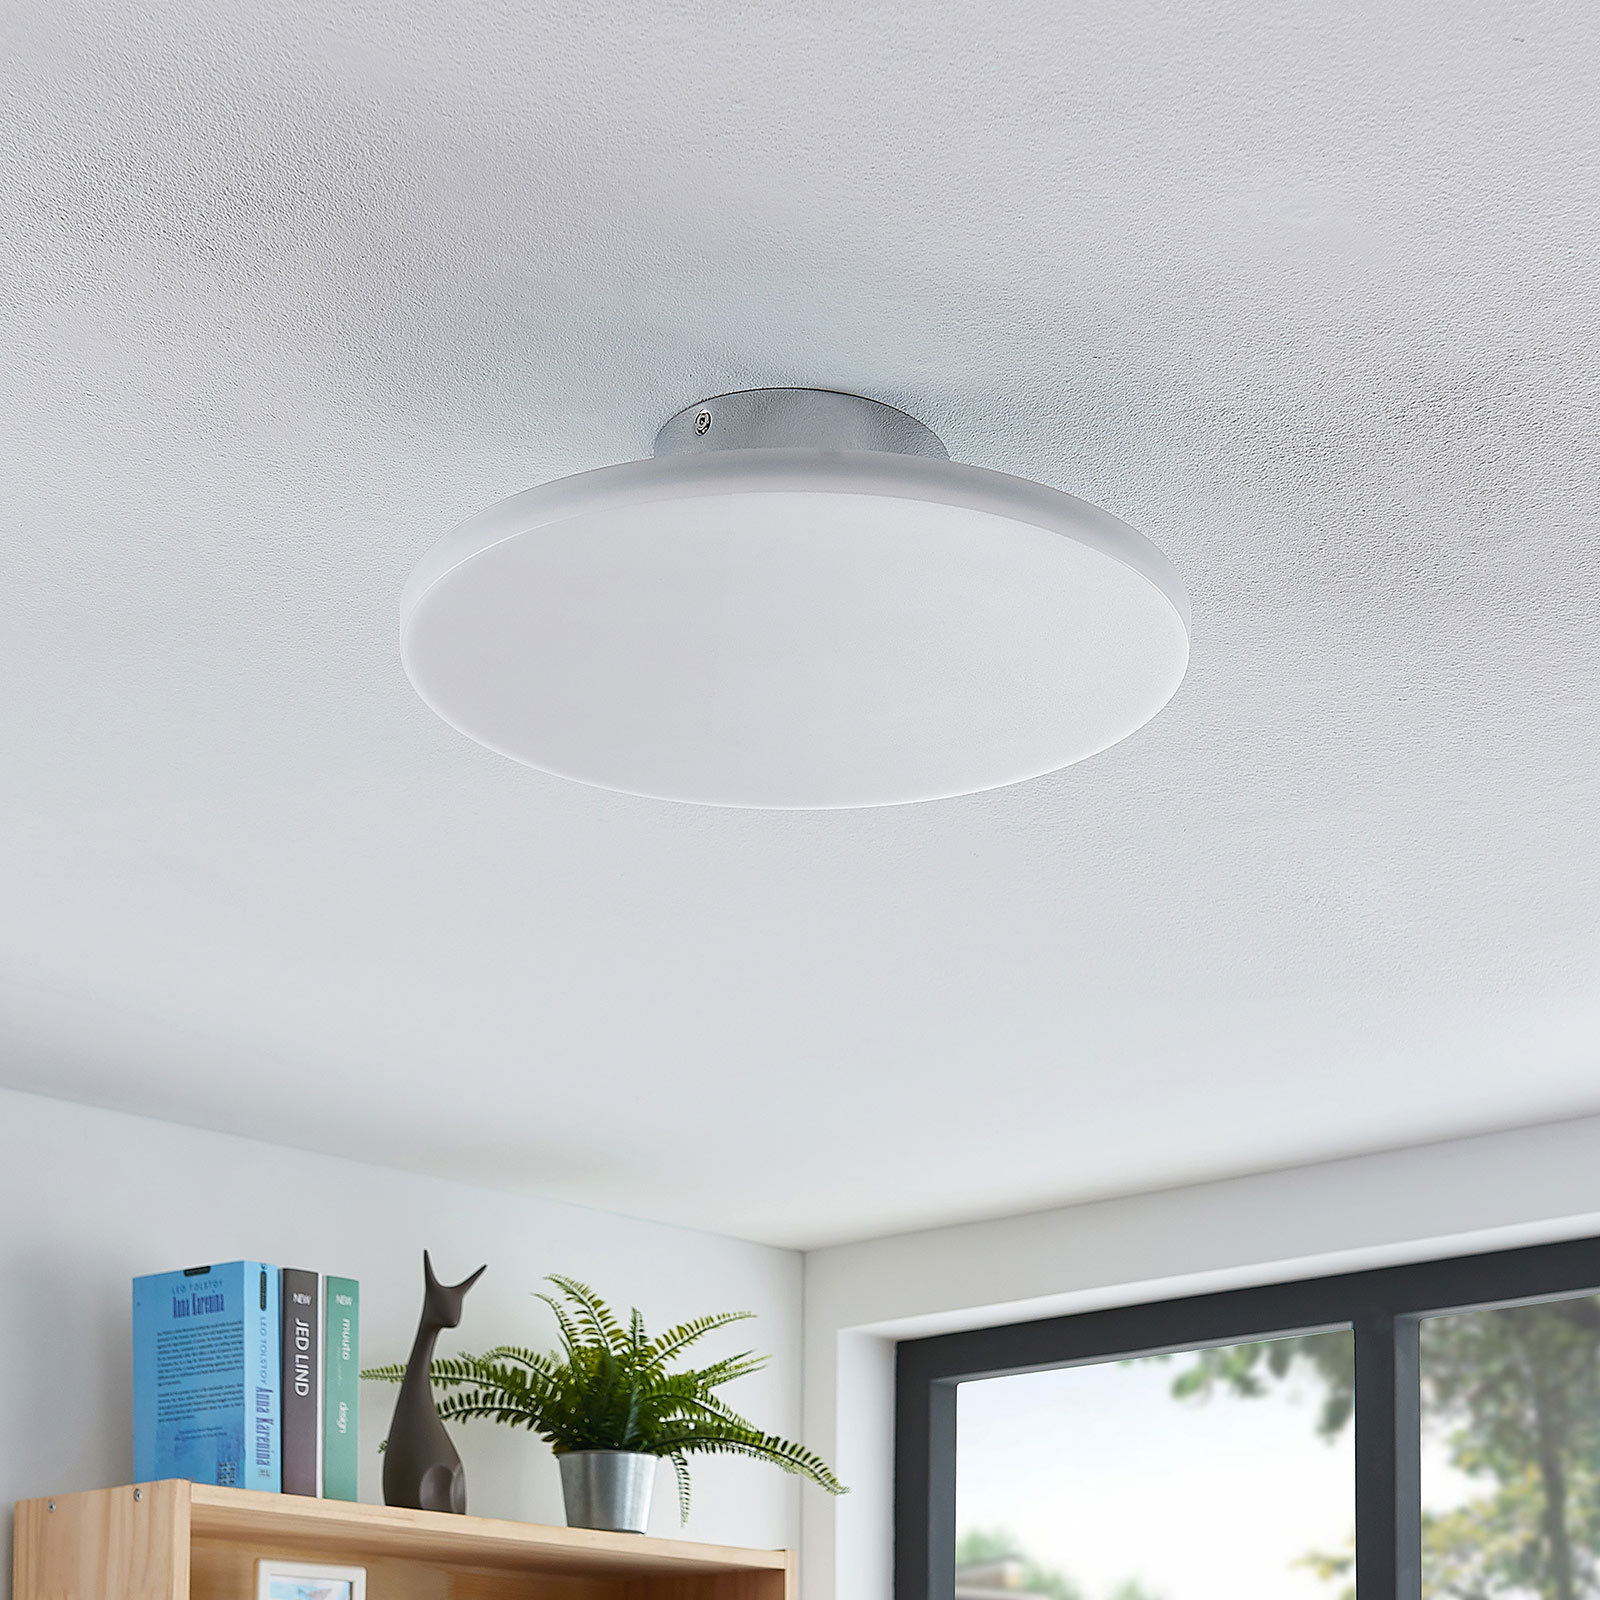 LED plafondlamp Sherko, rond, 1-lamp